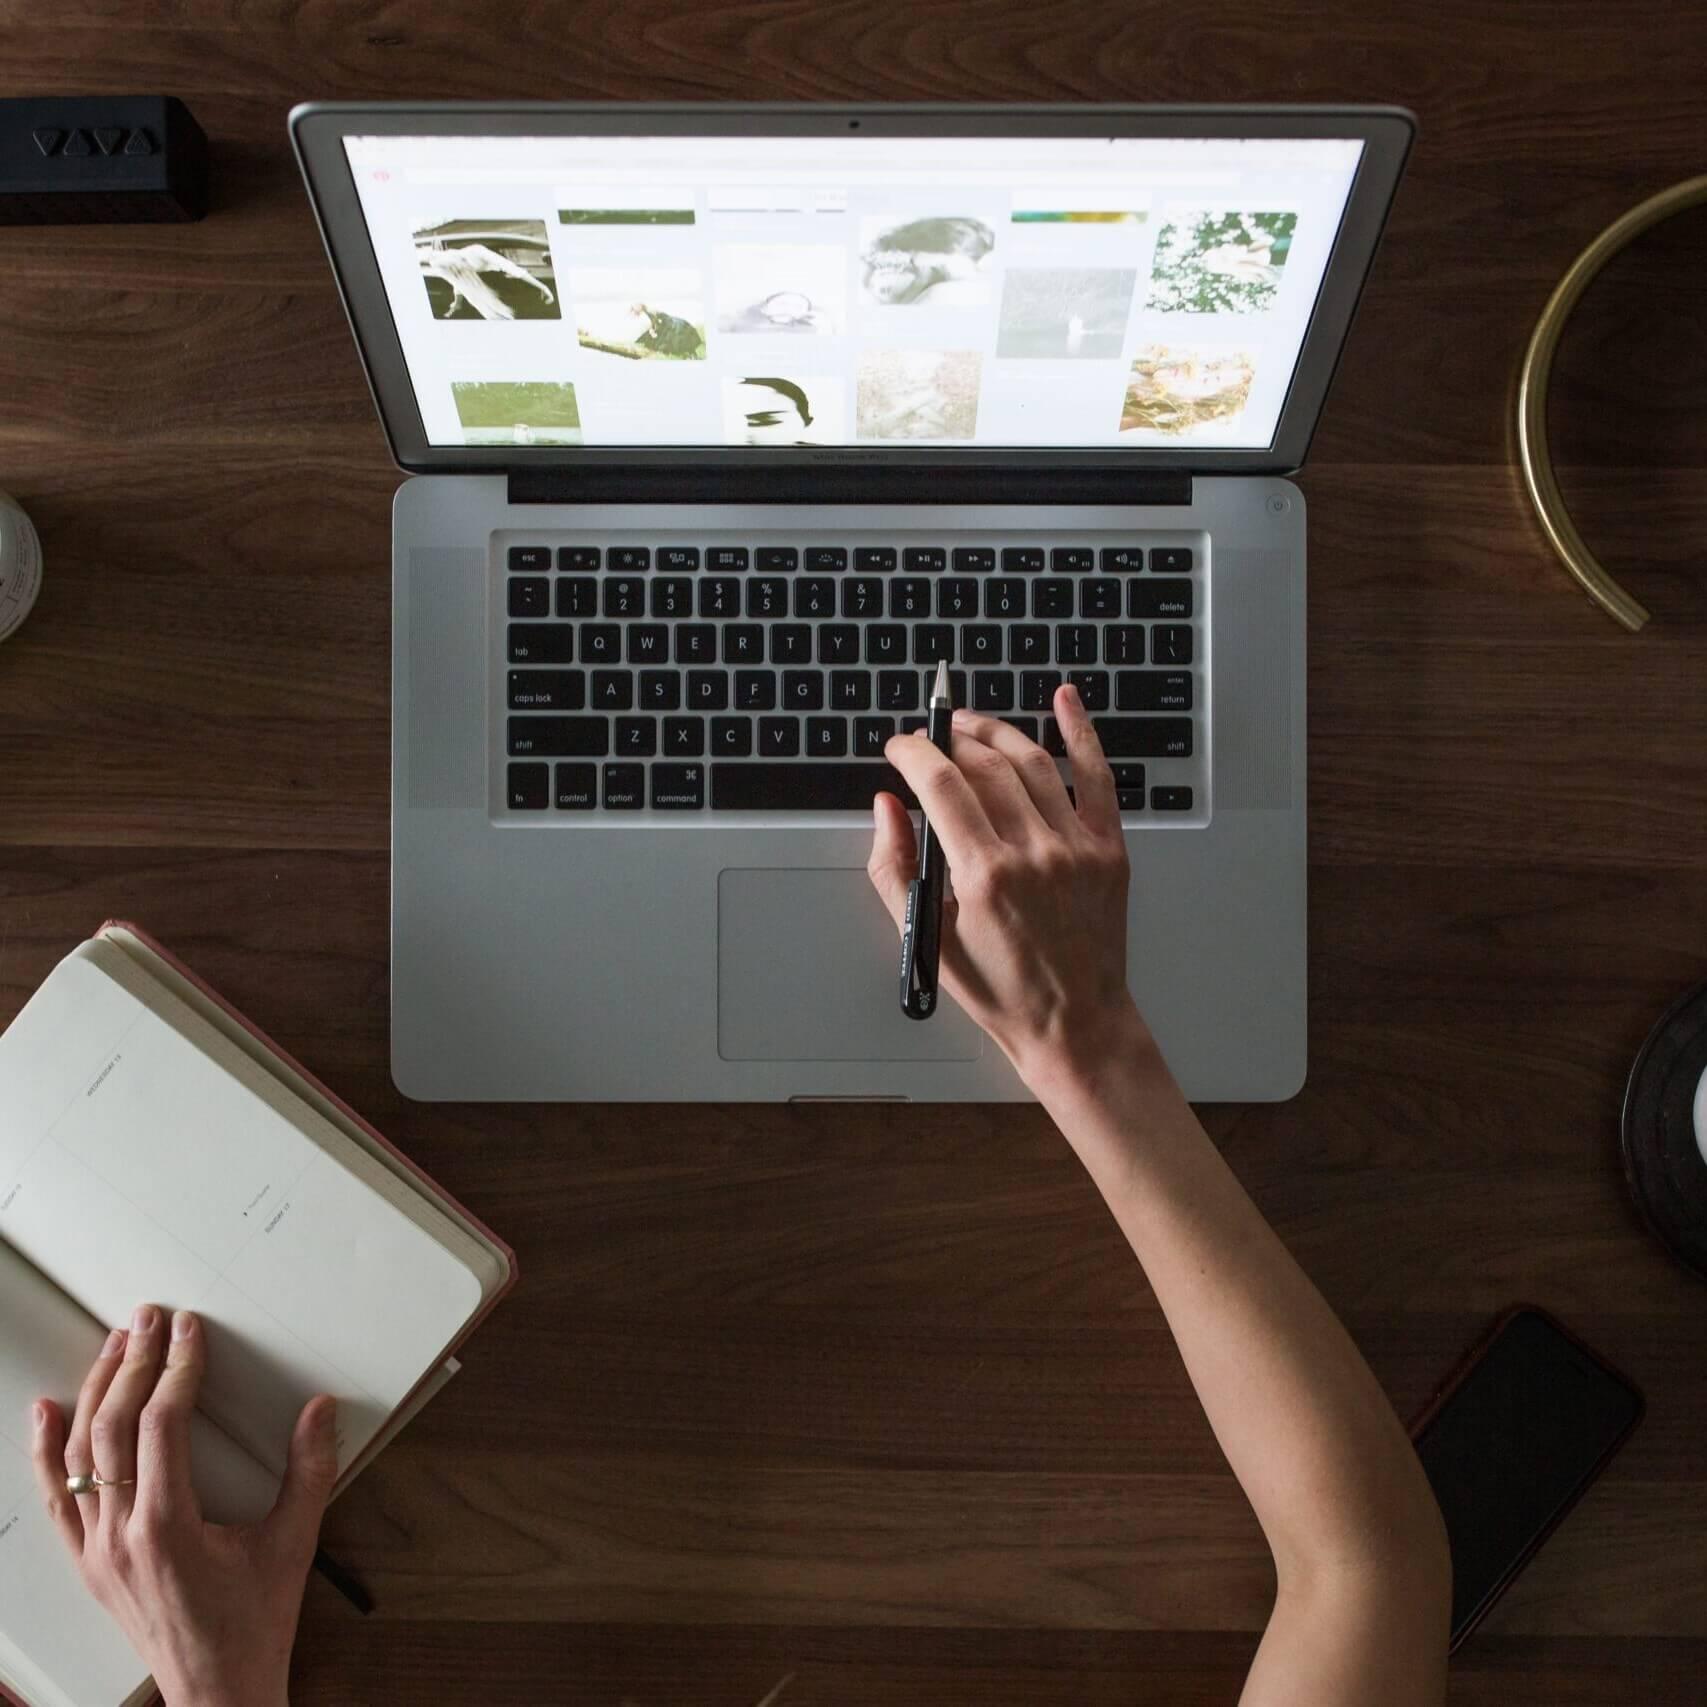 computer-desk-hand for instagram secrets you should know